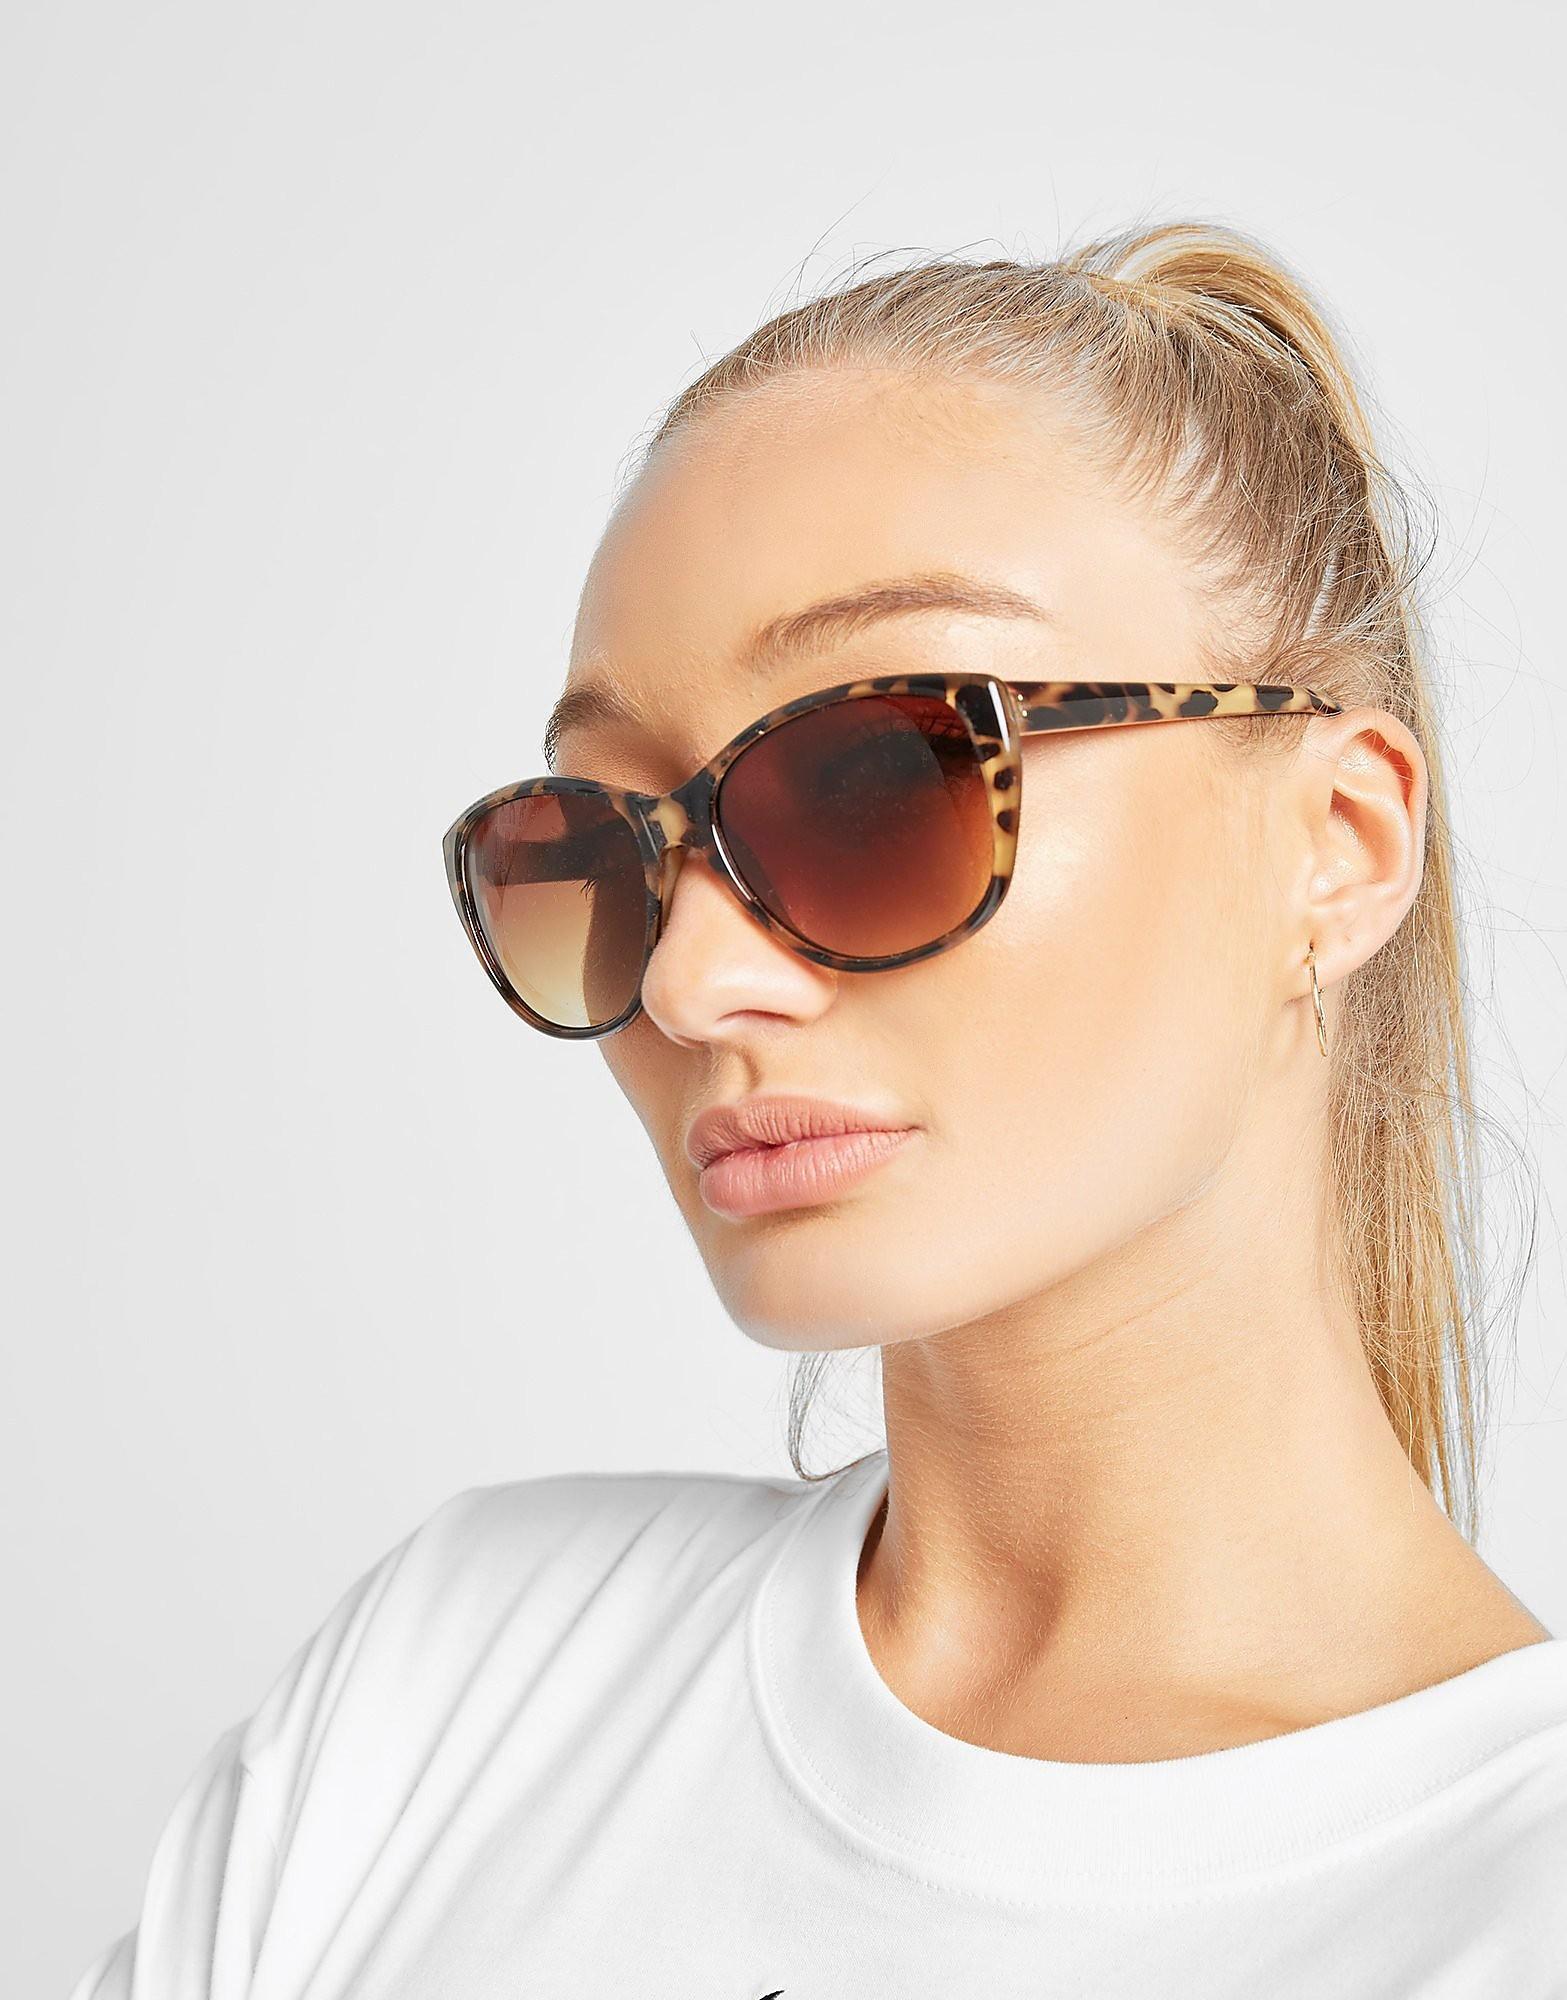 Brookhaven Louise Sonnenbrille in Schmetterlingsform